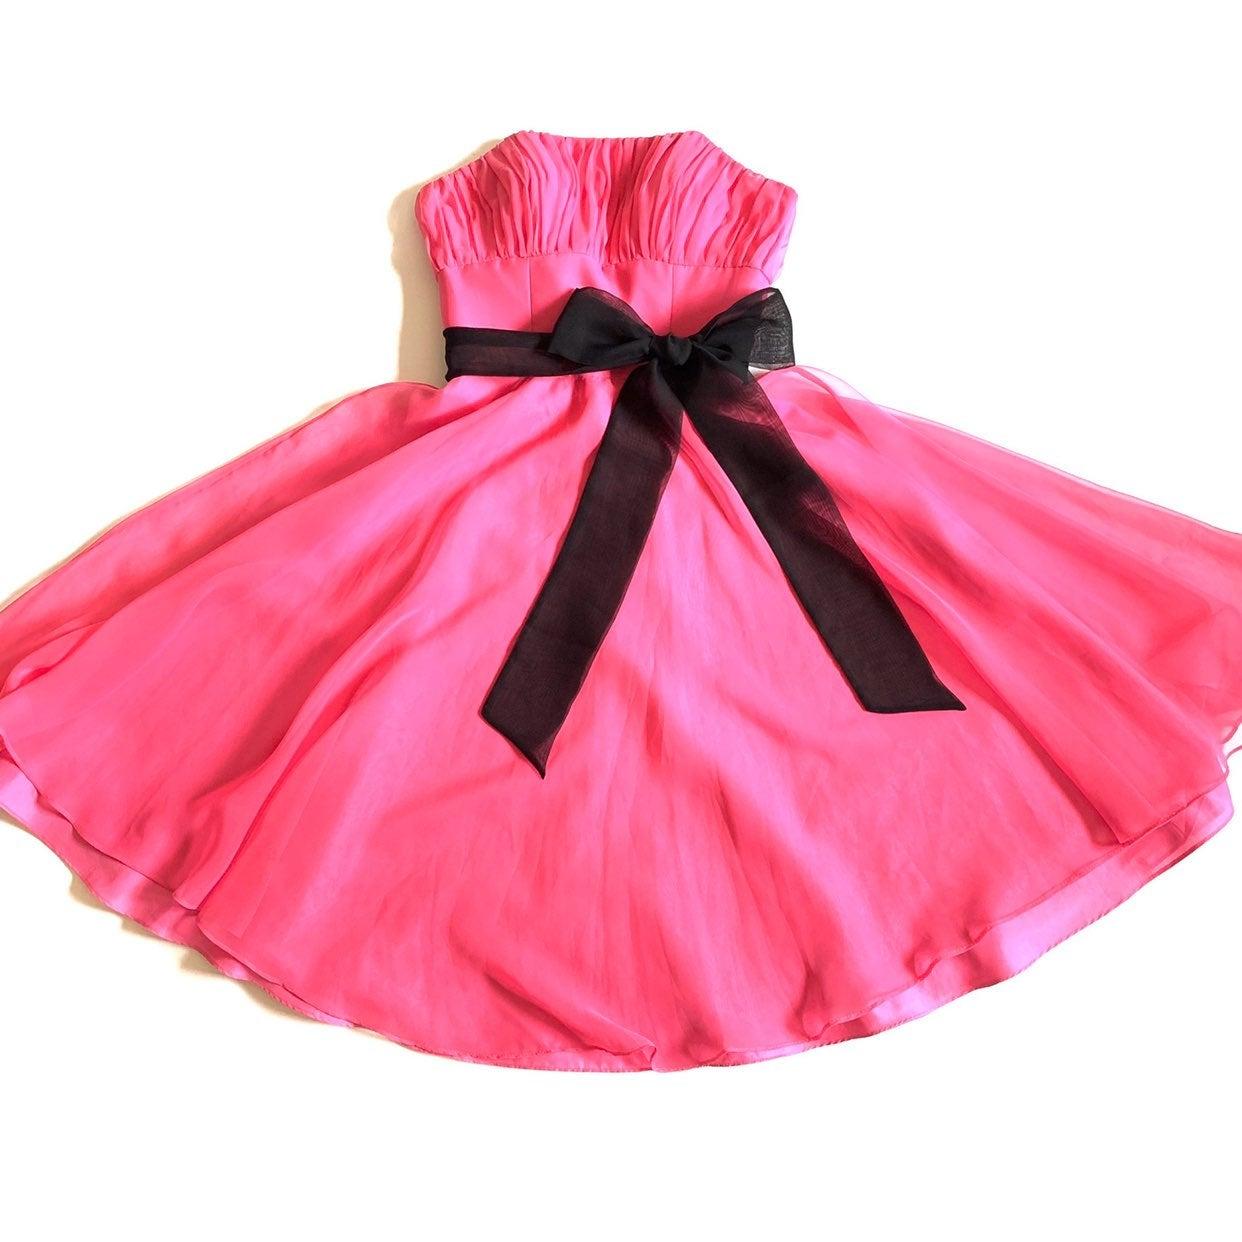 Mori Lee Dress By Madeline Gardner